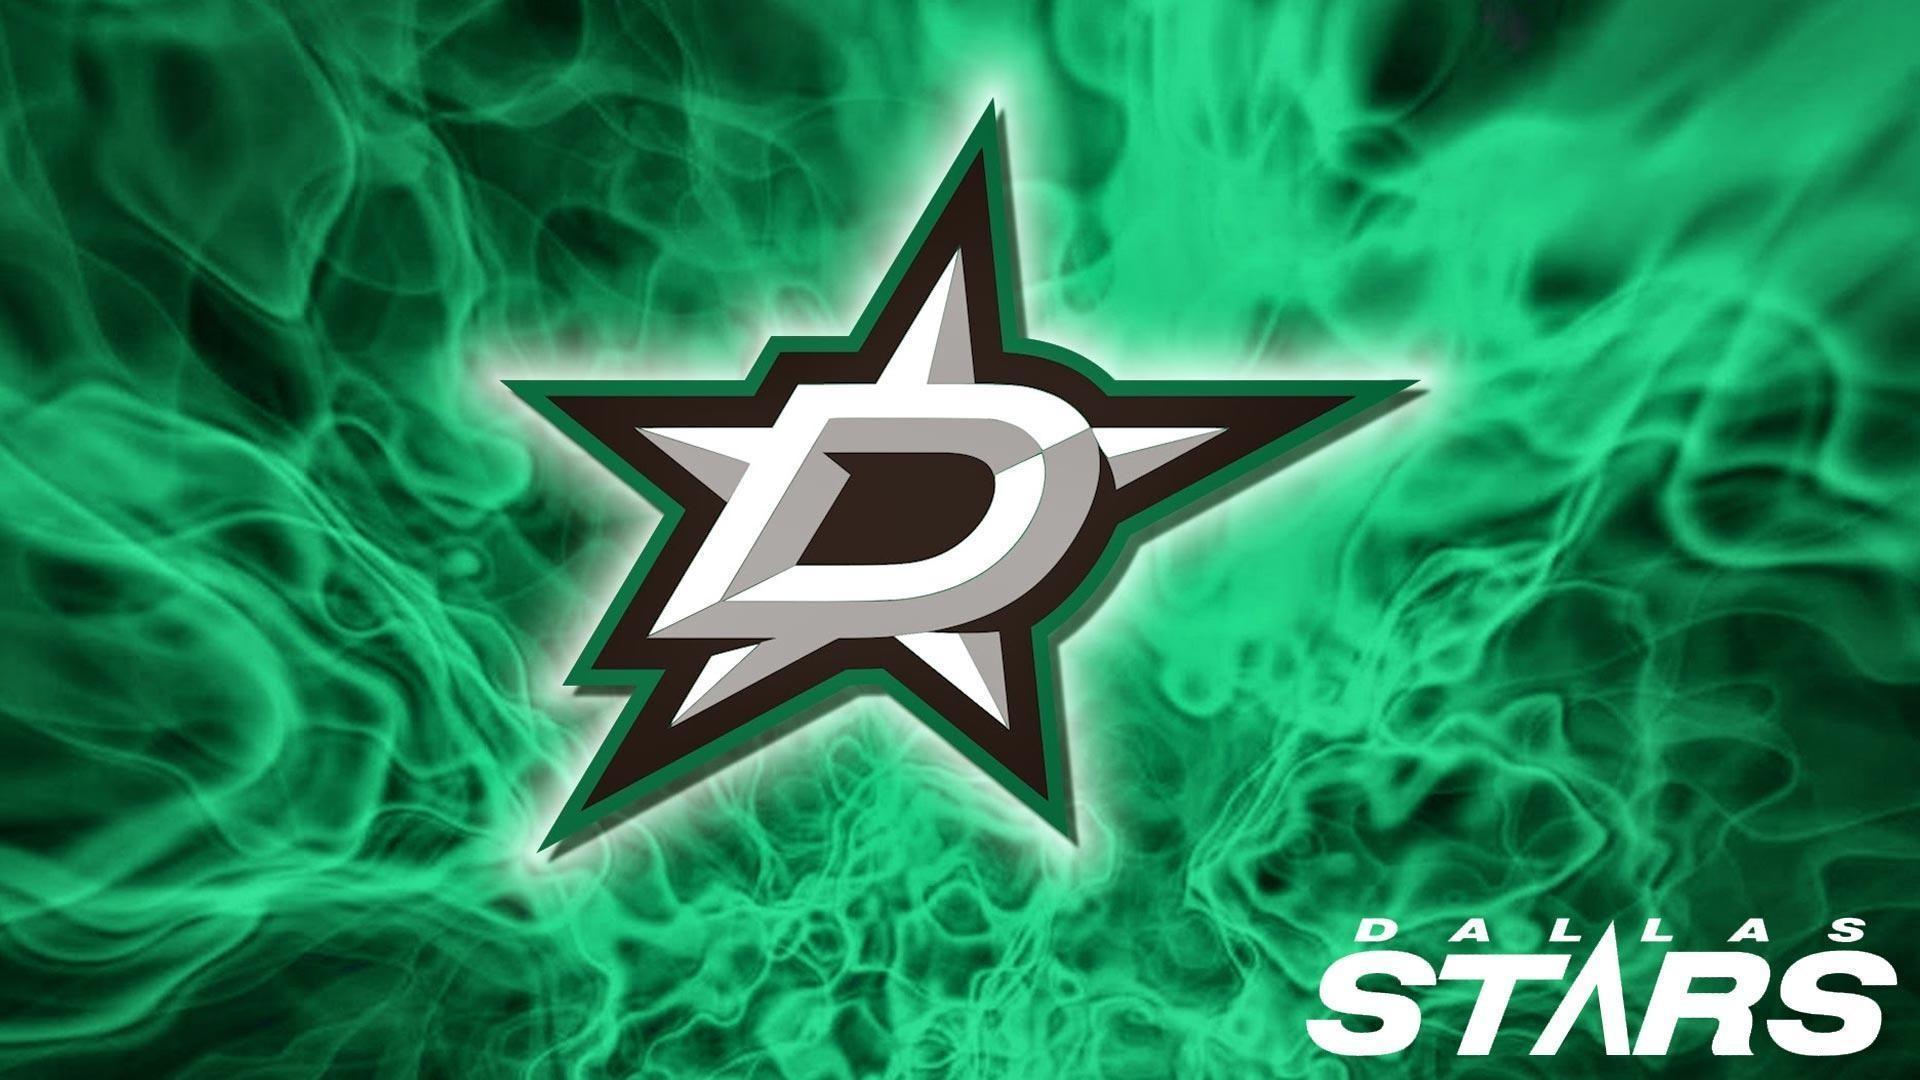 Dallas Stars New Logo Wallpaper – WallpaperSafari